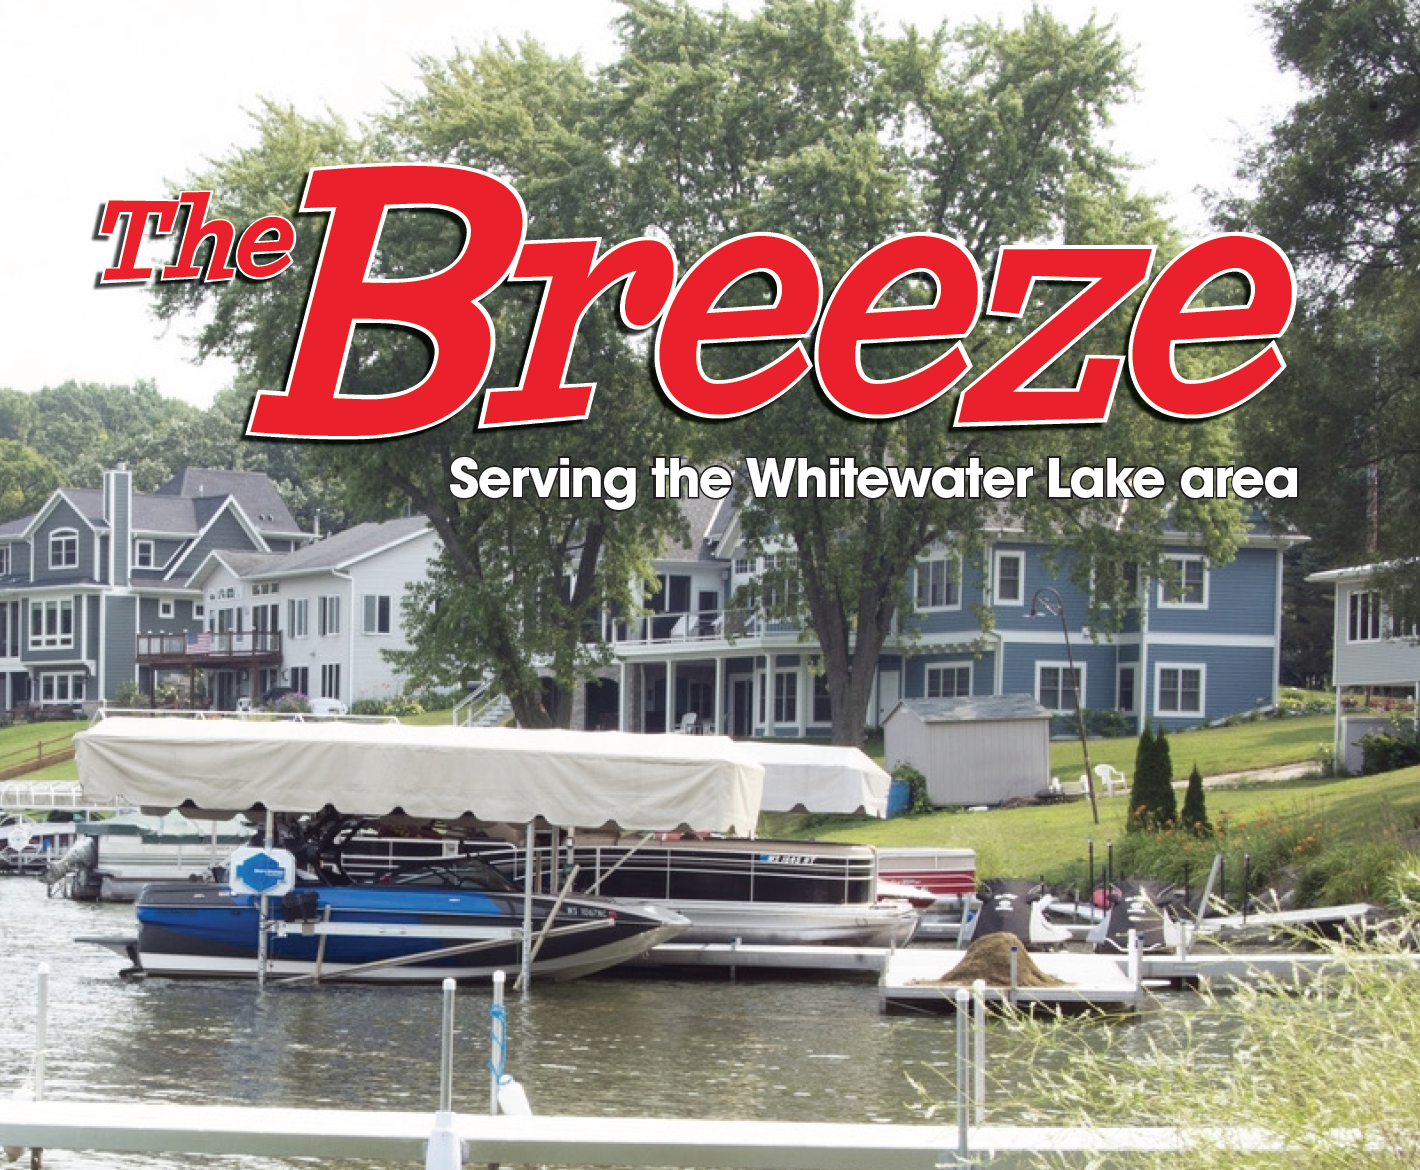 Whitewater Breeze May 2020